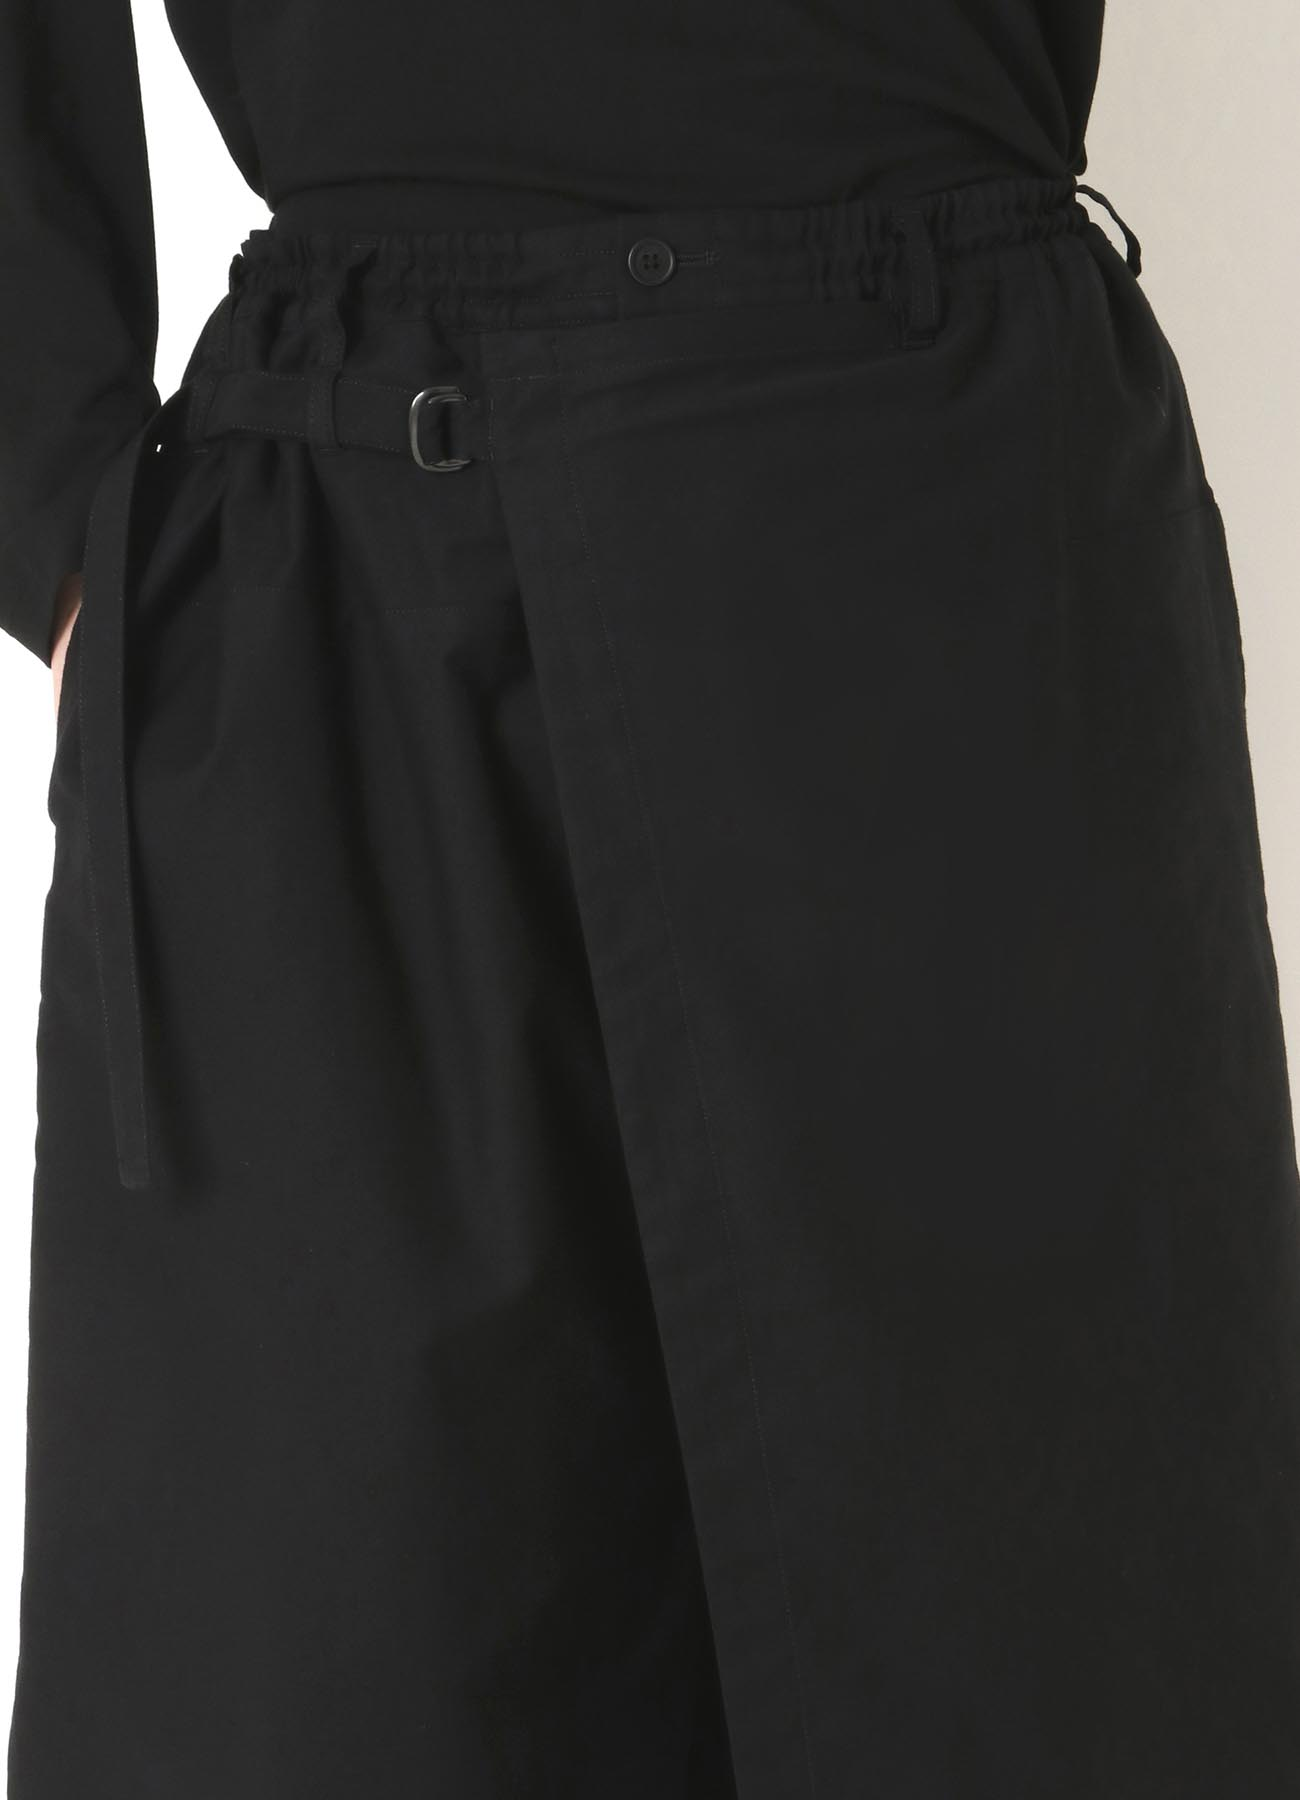 C/TWILL CLASSIC WRAP PANTS